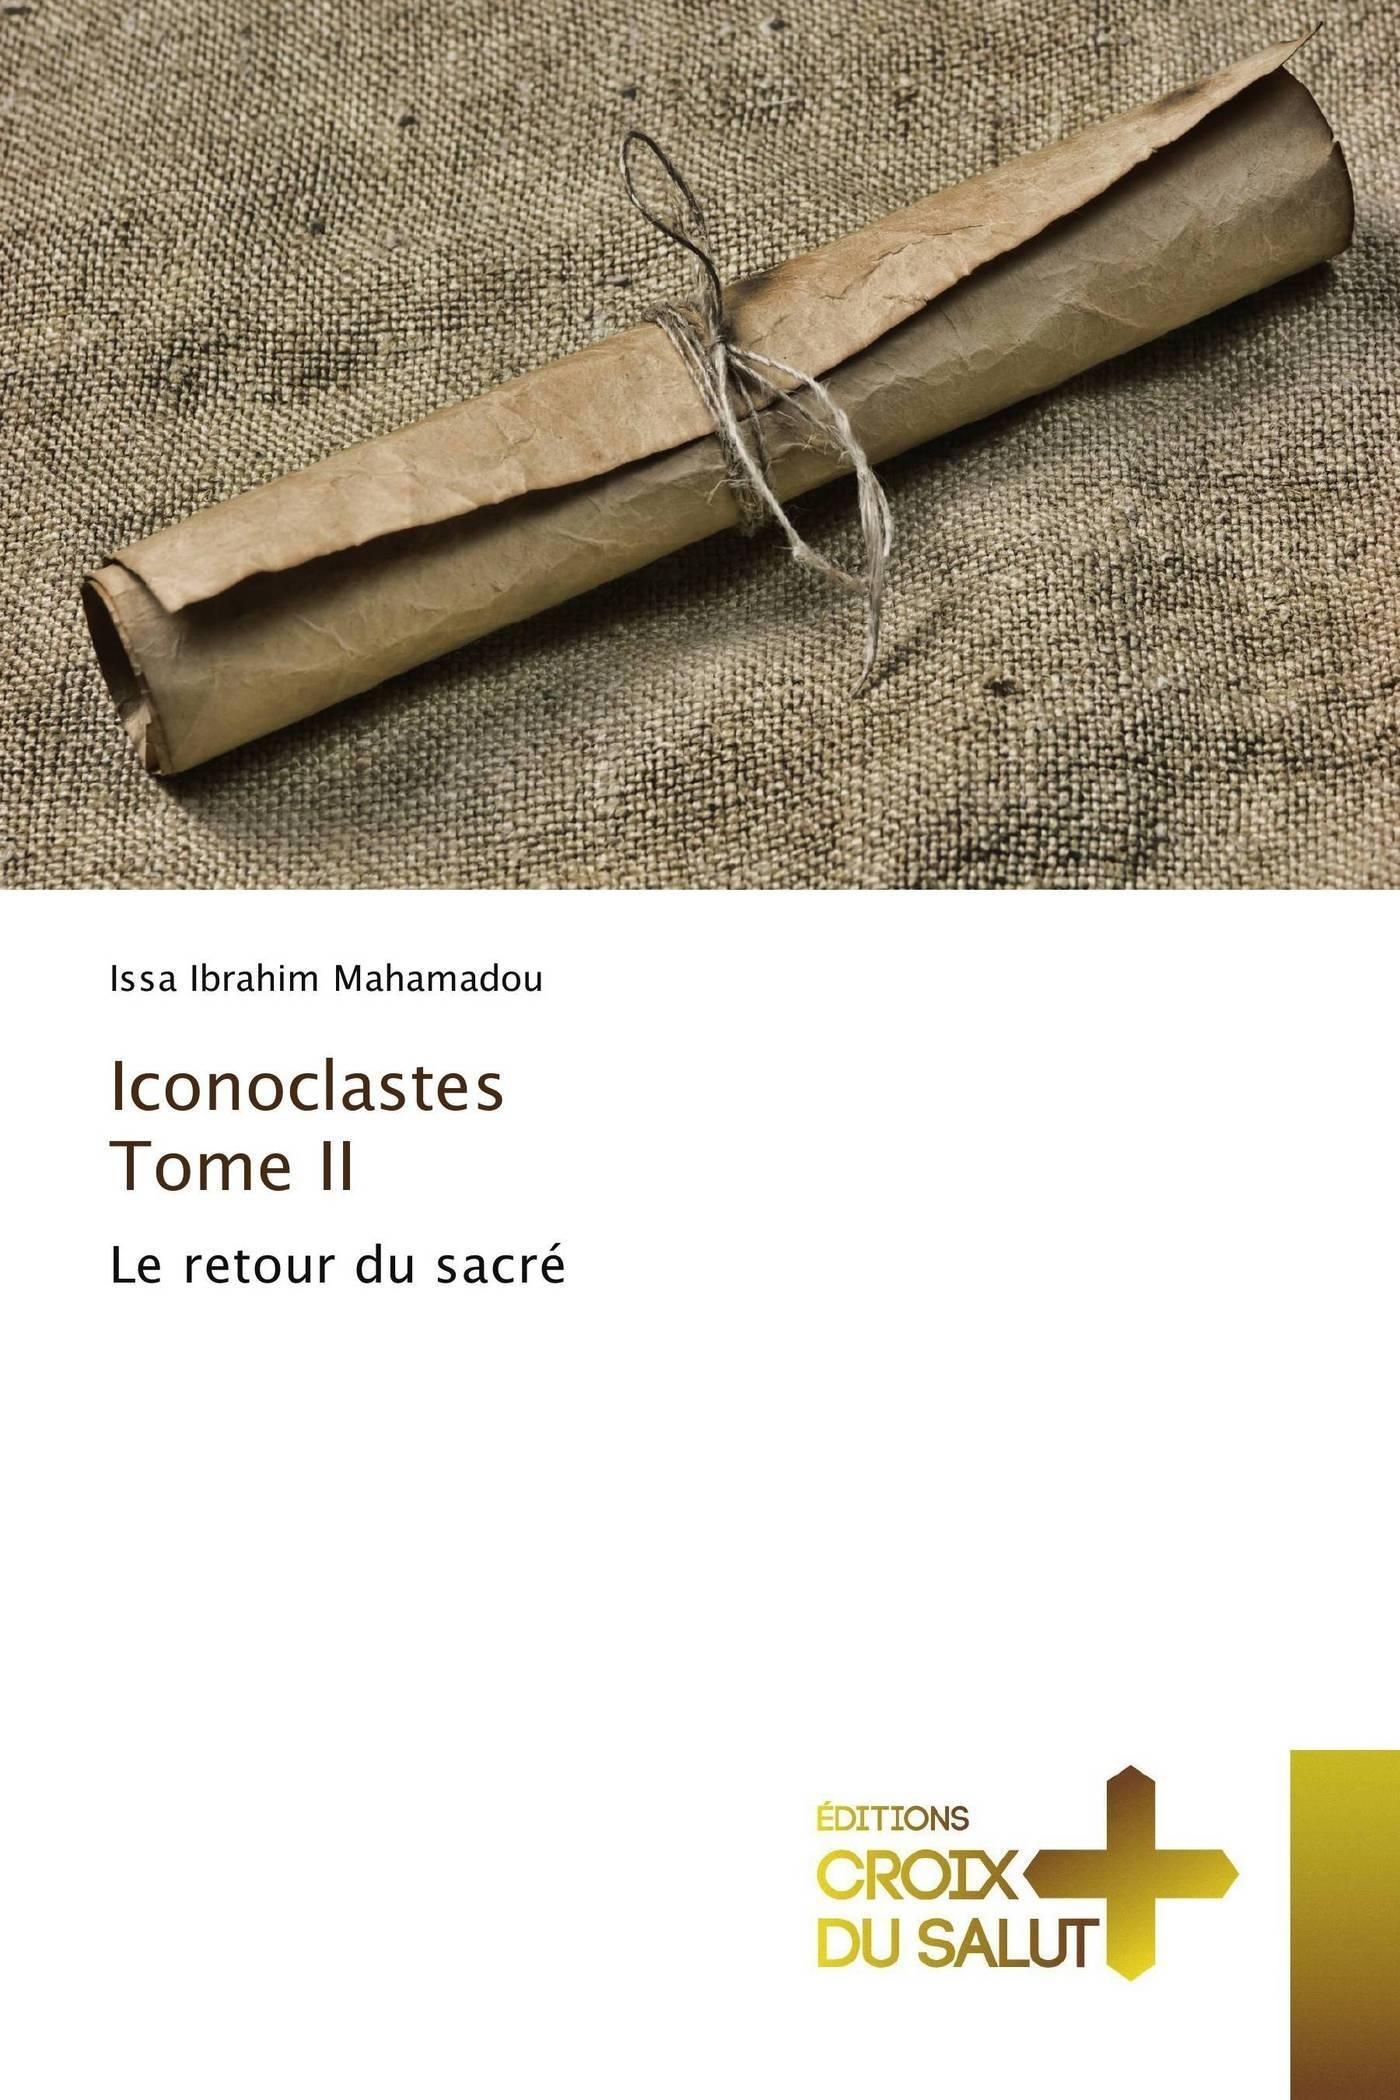 ICONOCLASTES TOME II